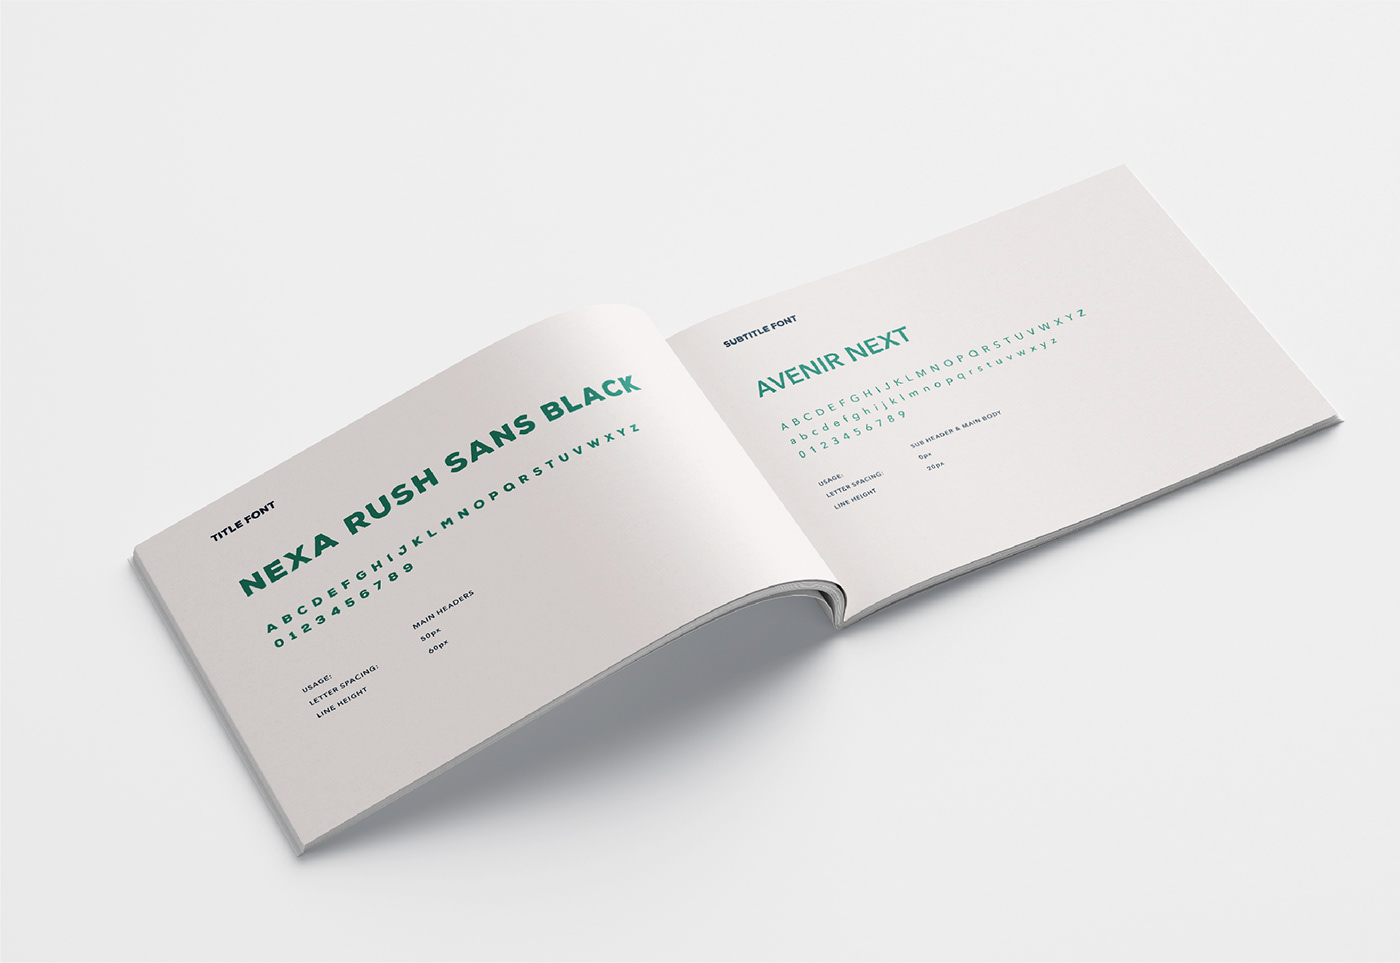 graphic design  Branding design fashion branding printing design brand guidelines